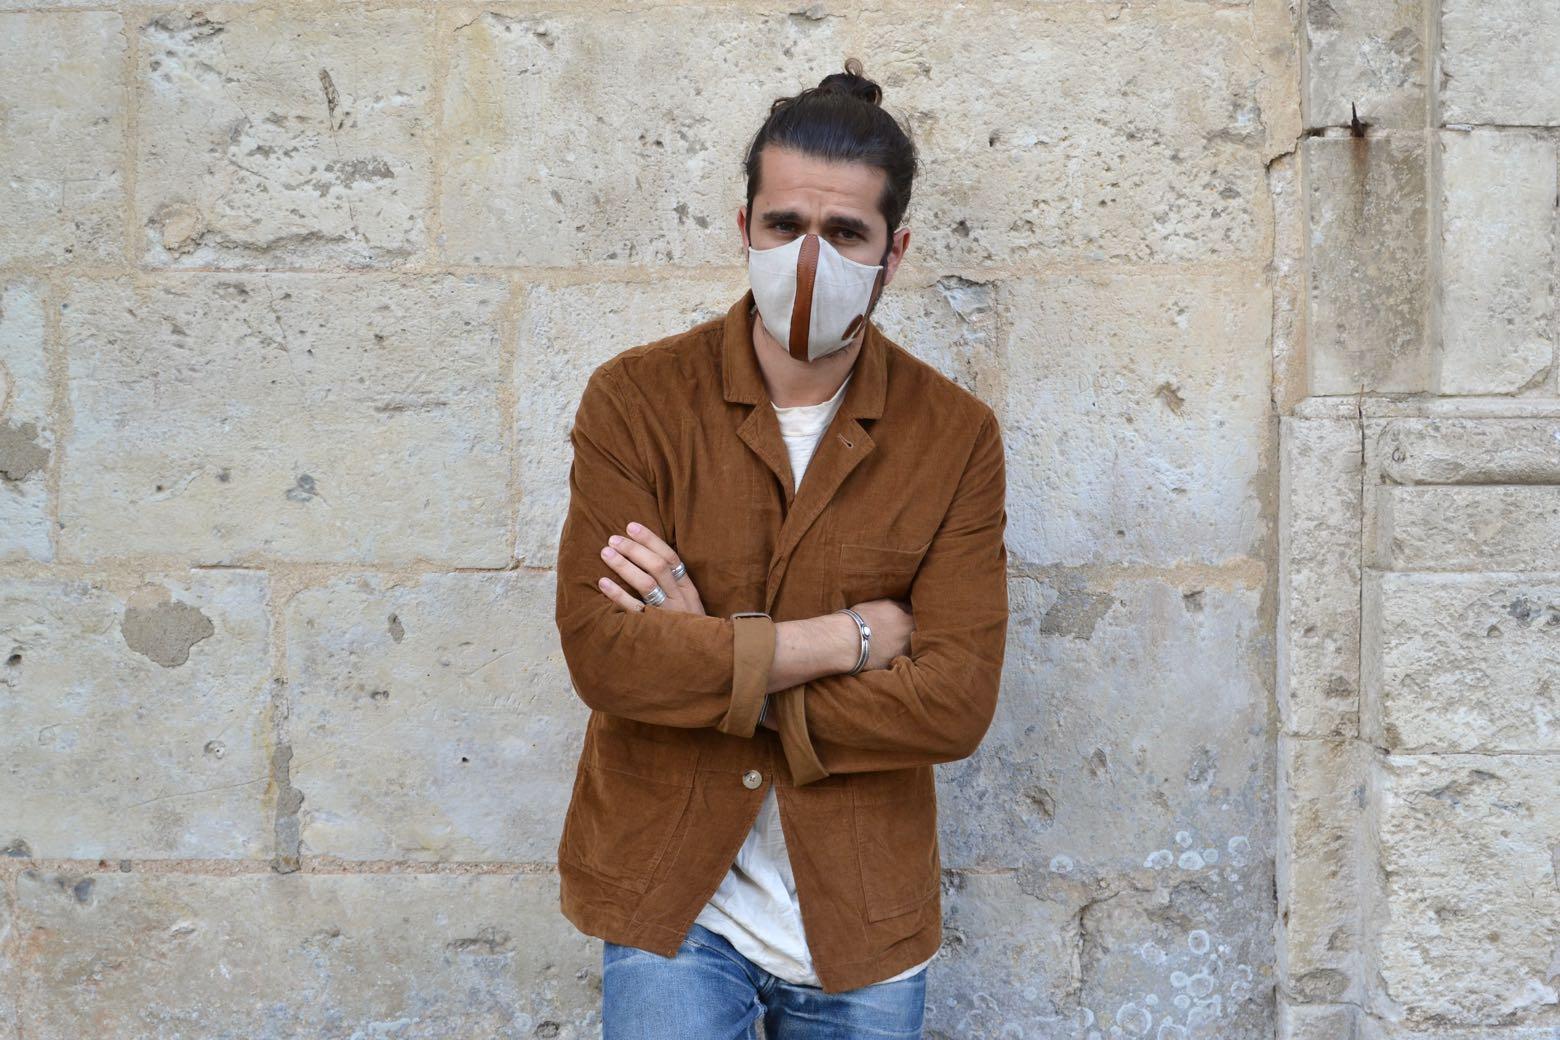 masque covid en lin écru et cuir marron made in france de la marque 5eme generation et blazer workwear kenmore kestin en velours